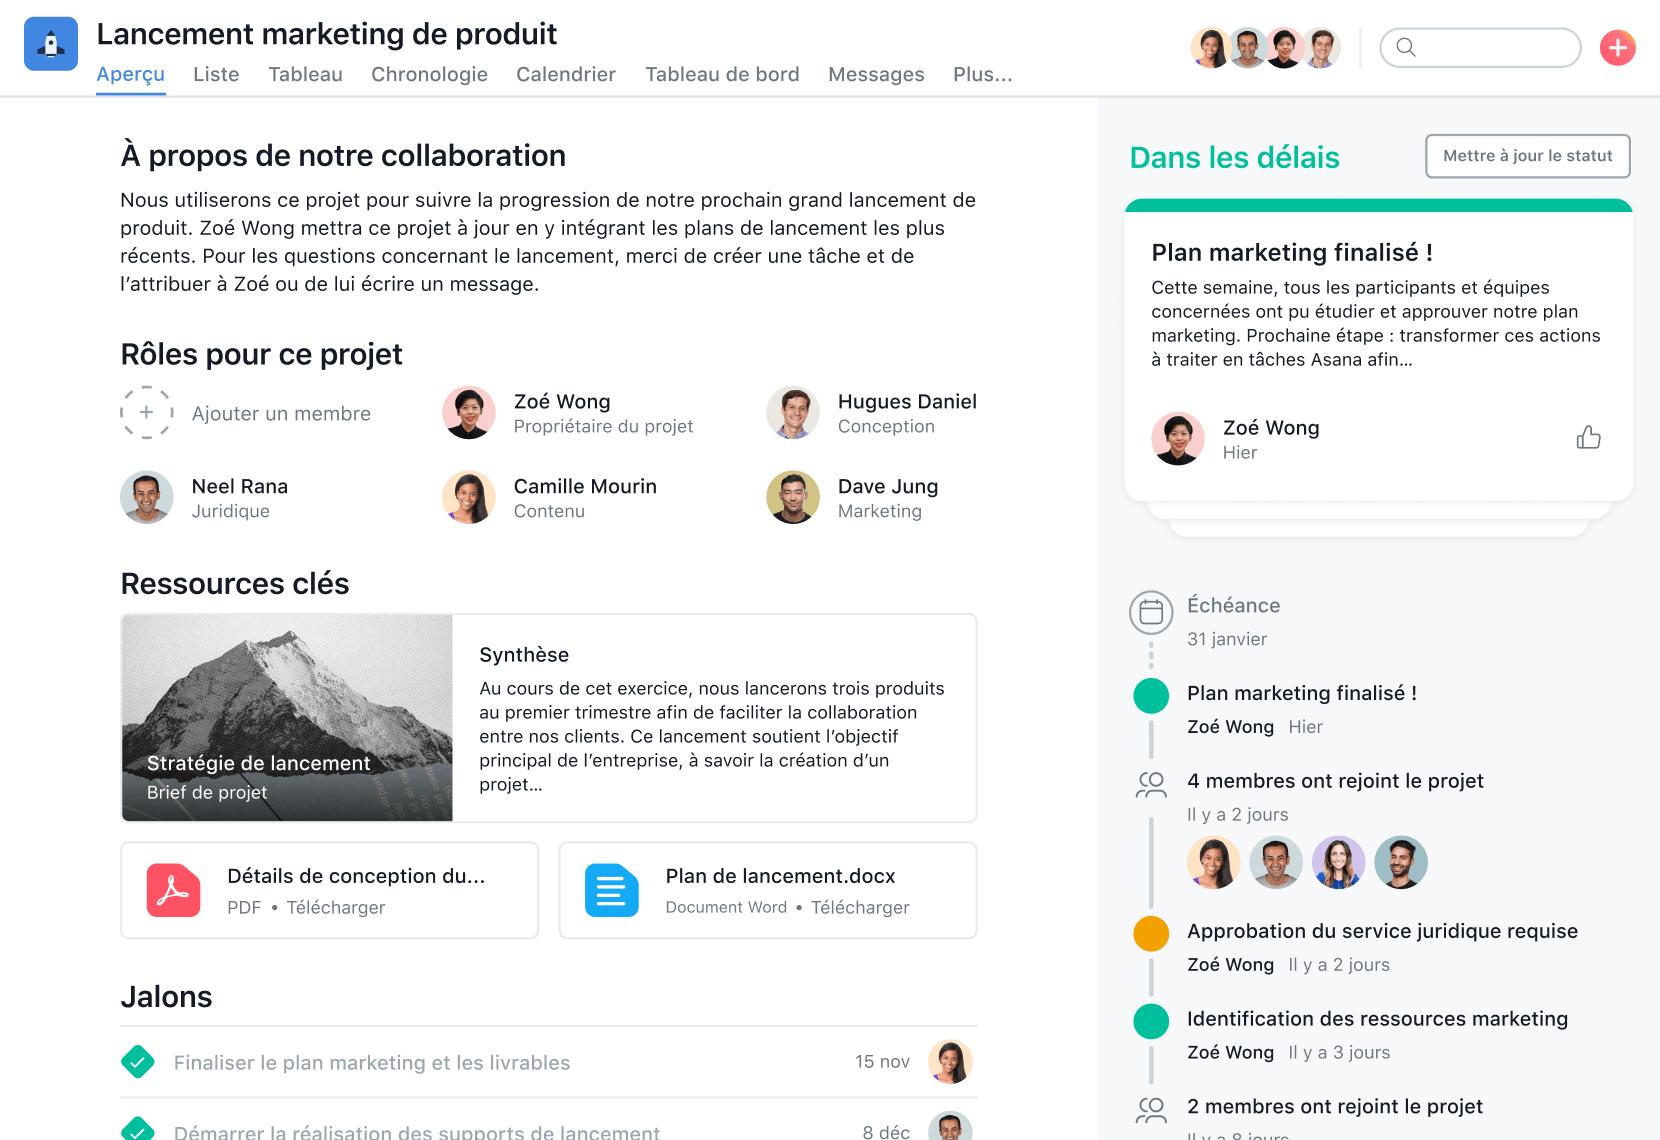 Gestion des projets marketing